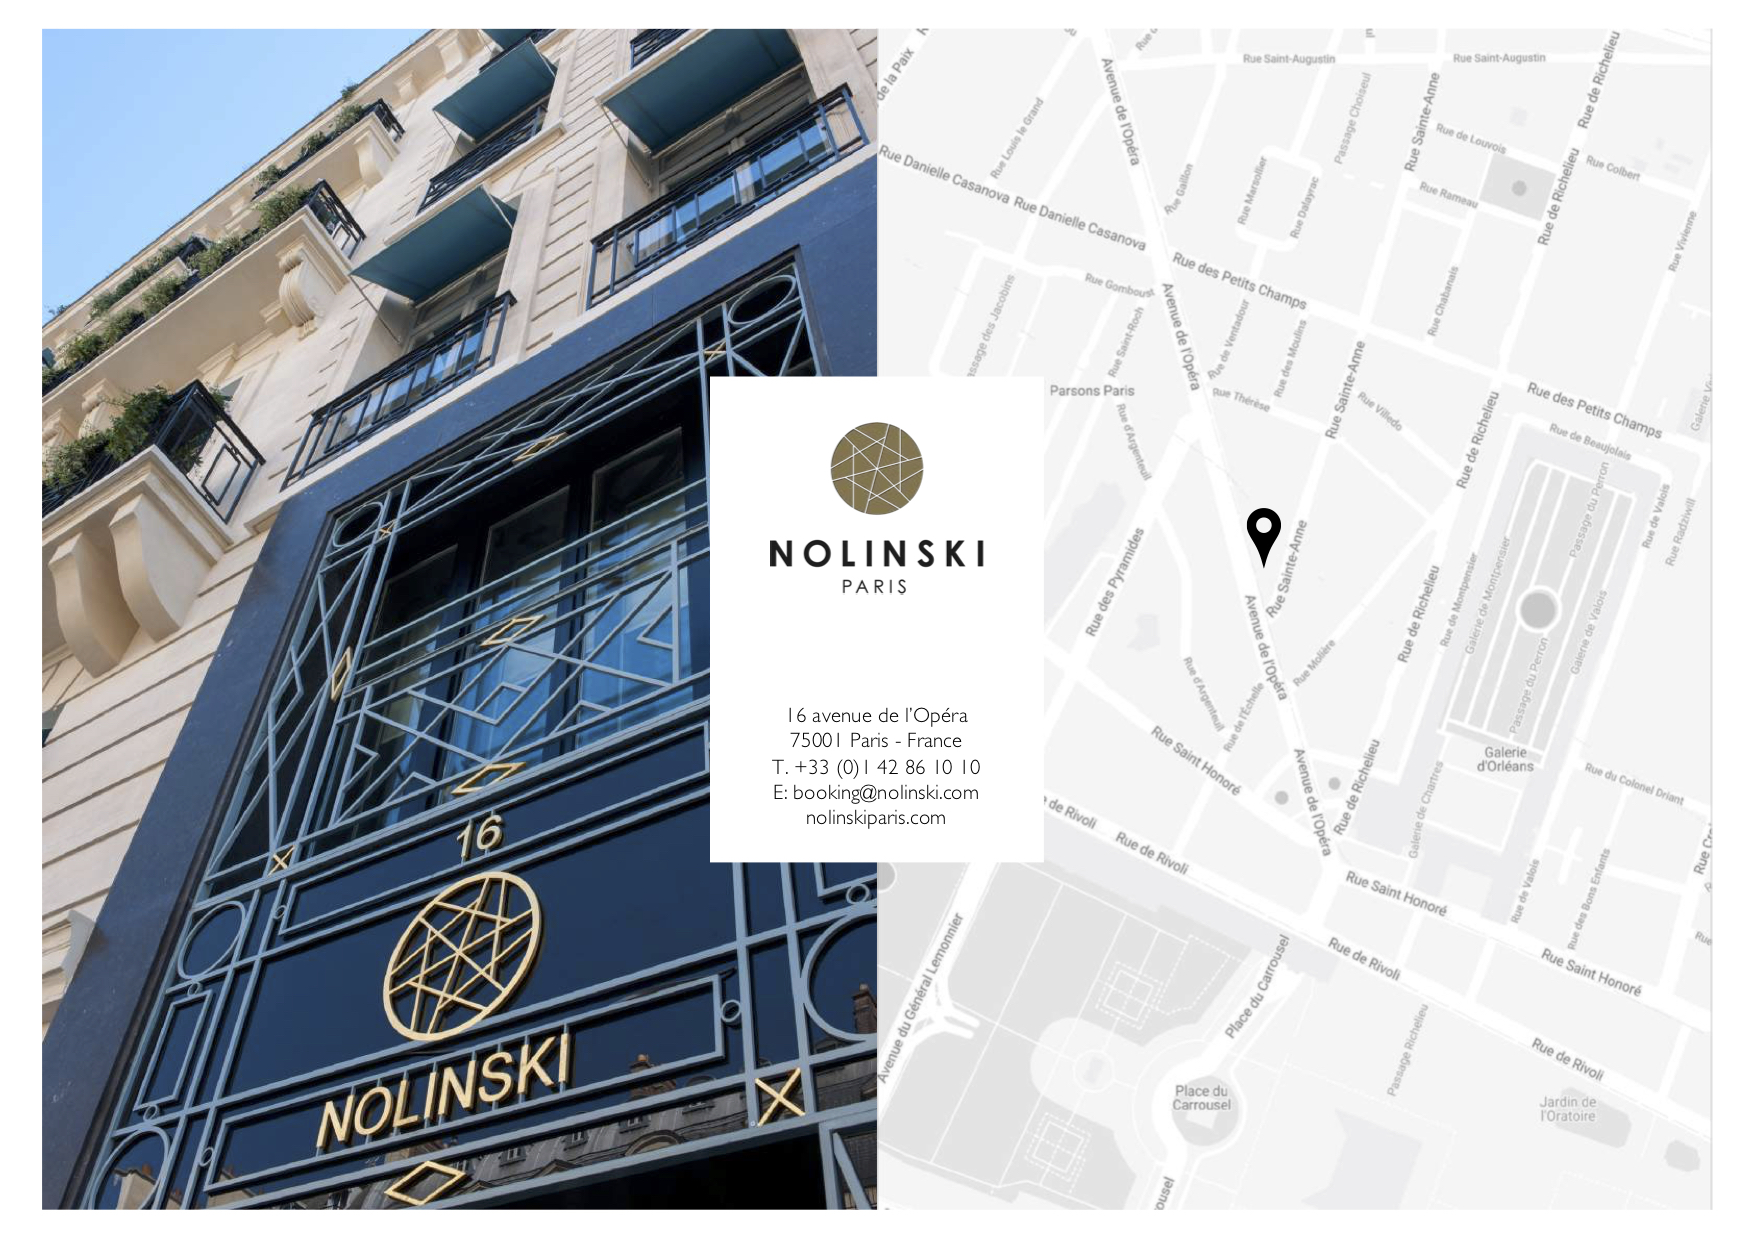 Nolinski map.jpg